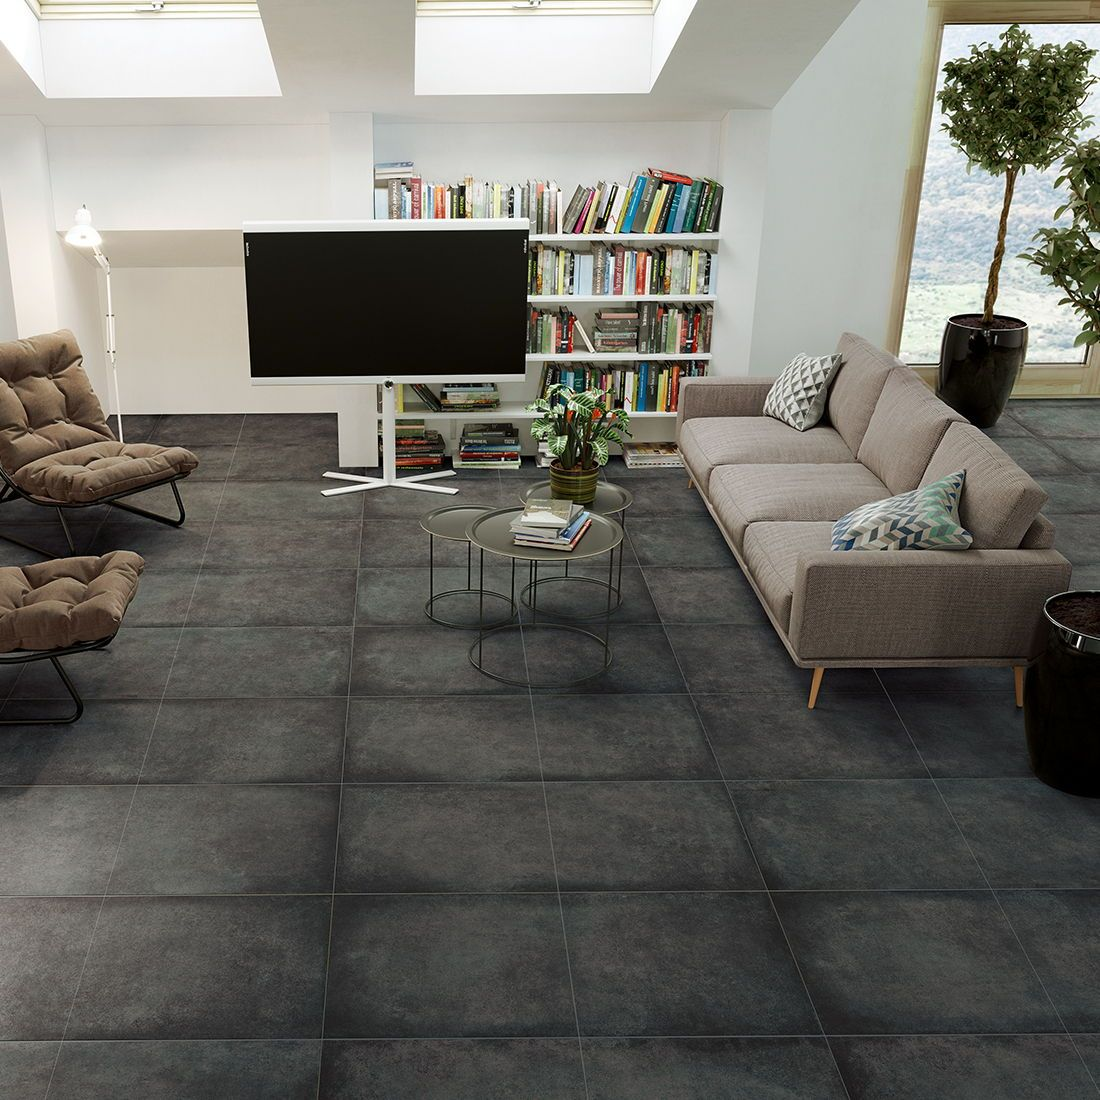 60 Living Room Tiles Ideas Living Room Tiles Room Tiles T